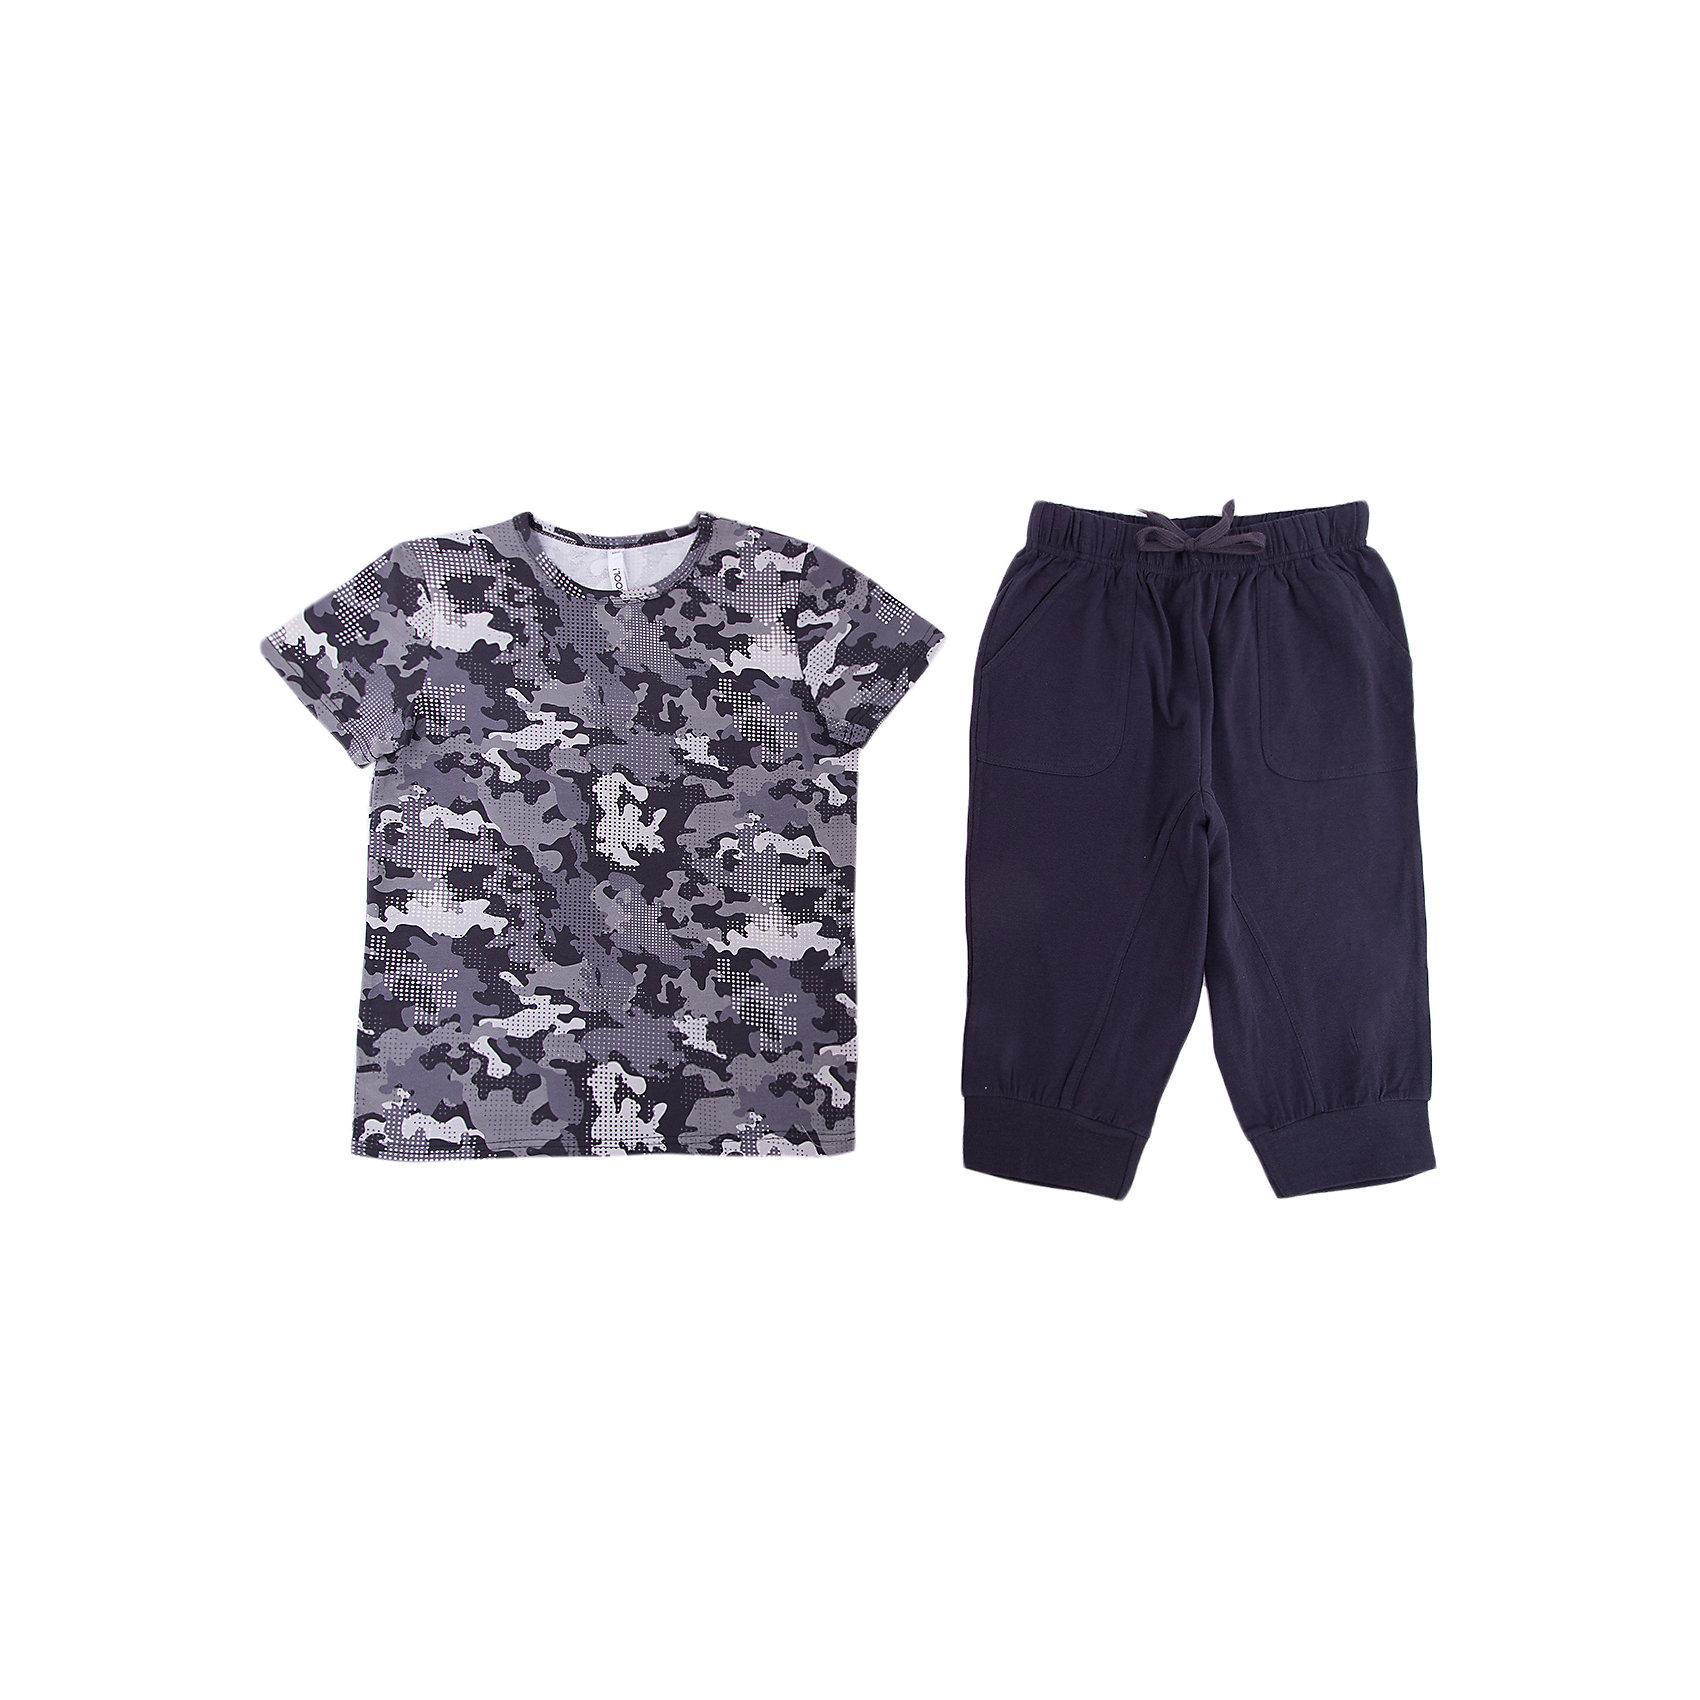 S'cool Комплект: футболка и бриджи для мальчика S'cool бриджи unistyle бриджи